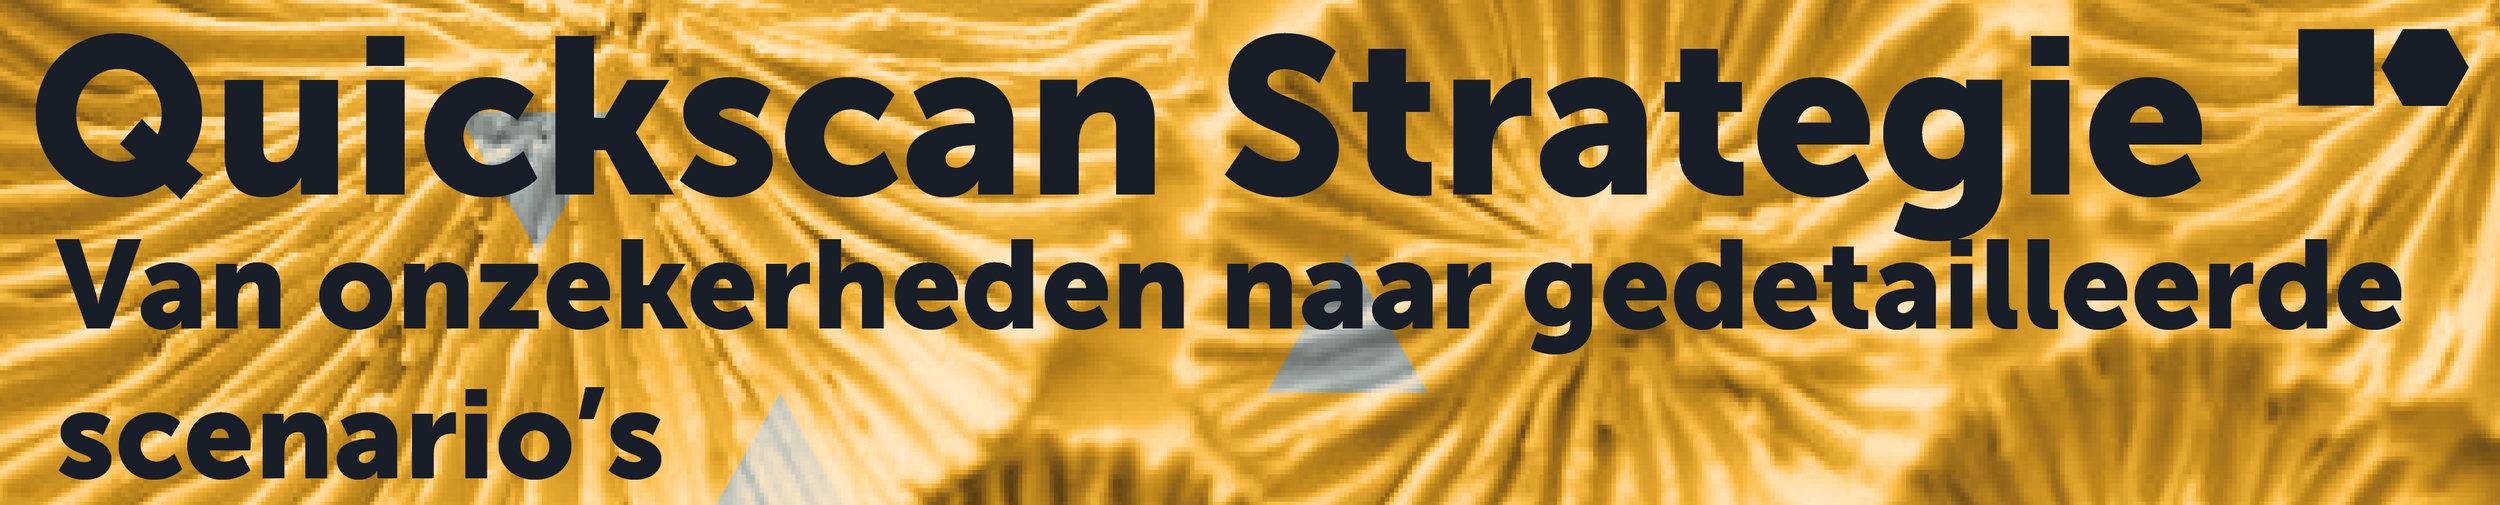 Banner-web26.jpg